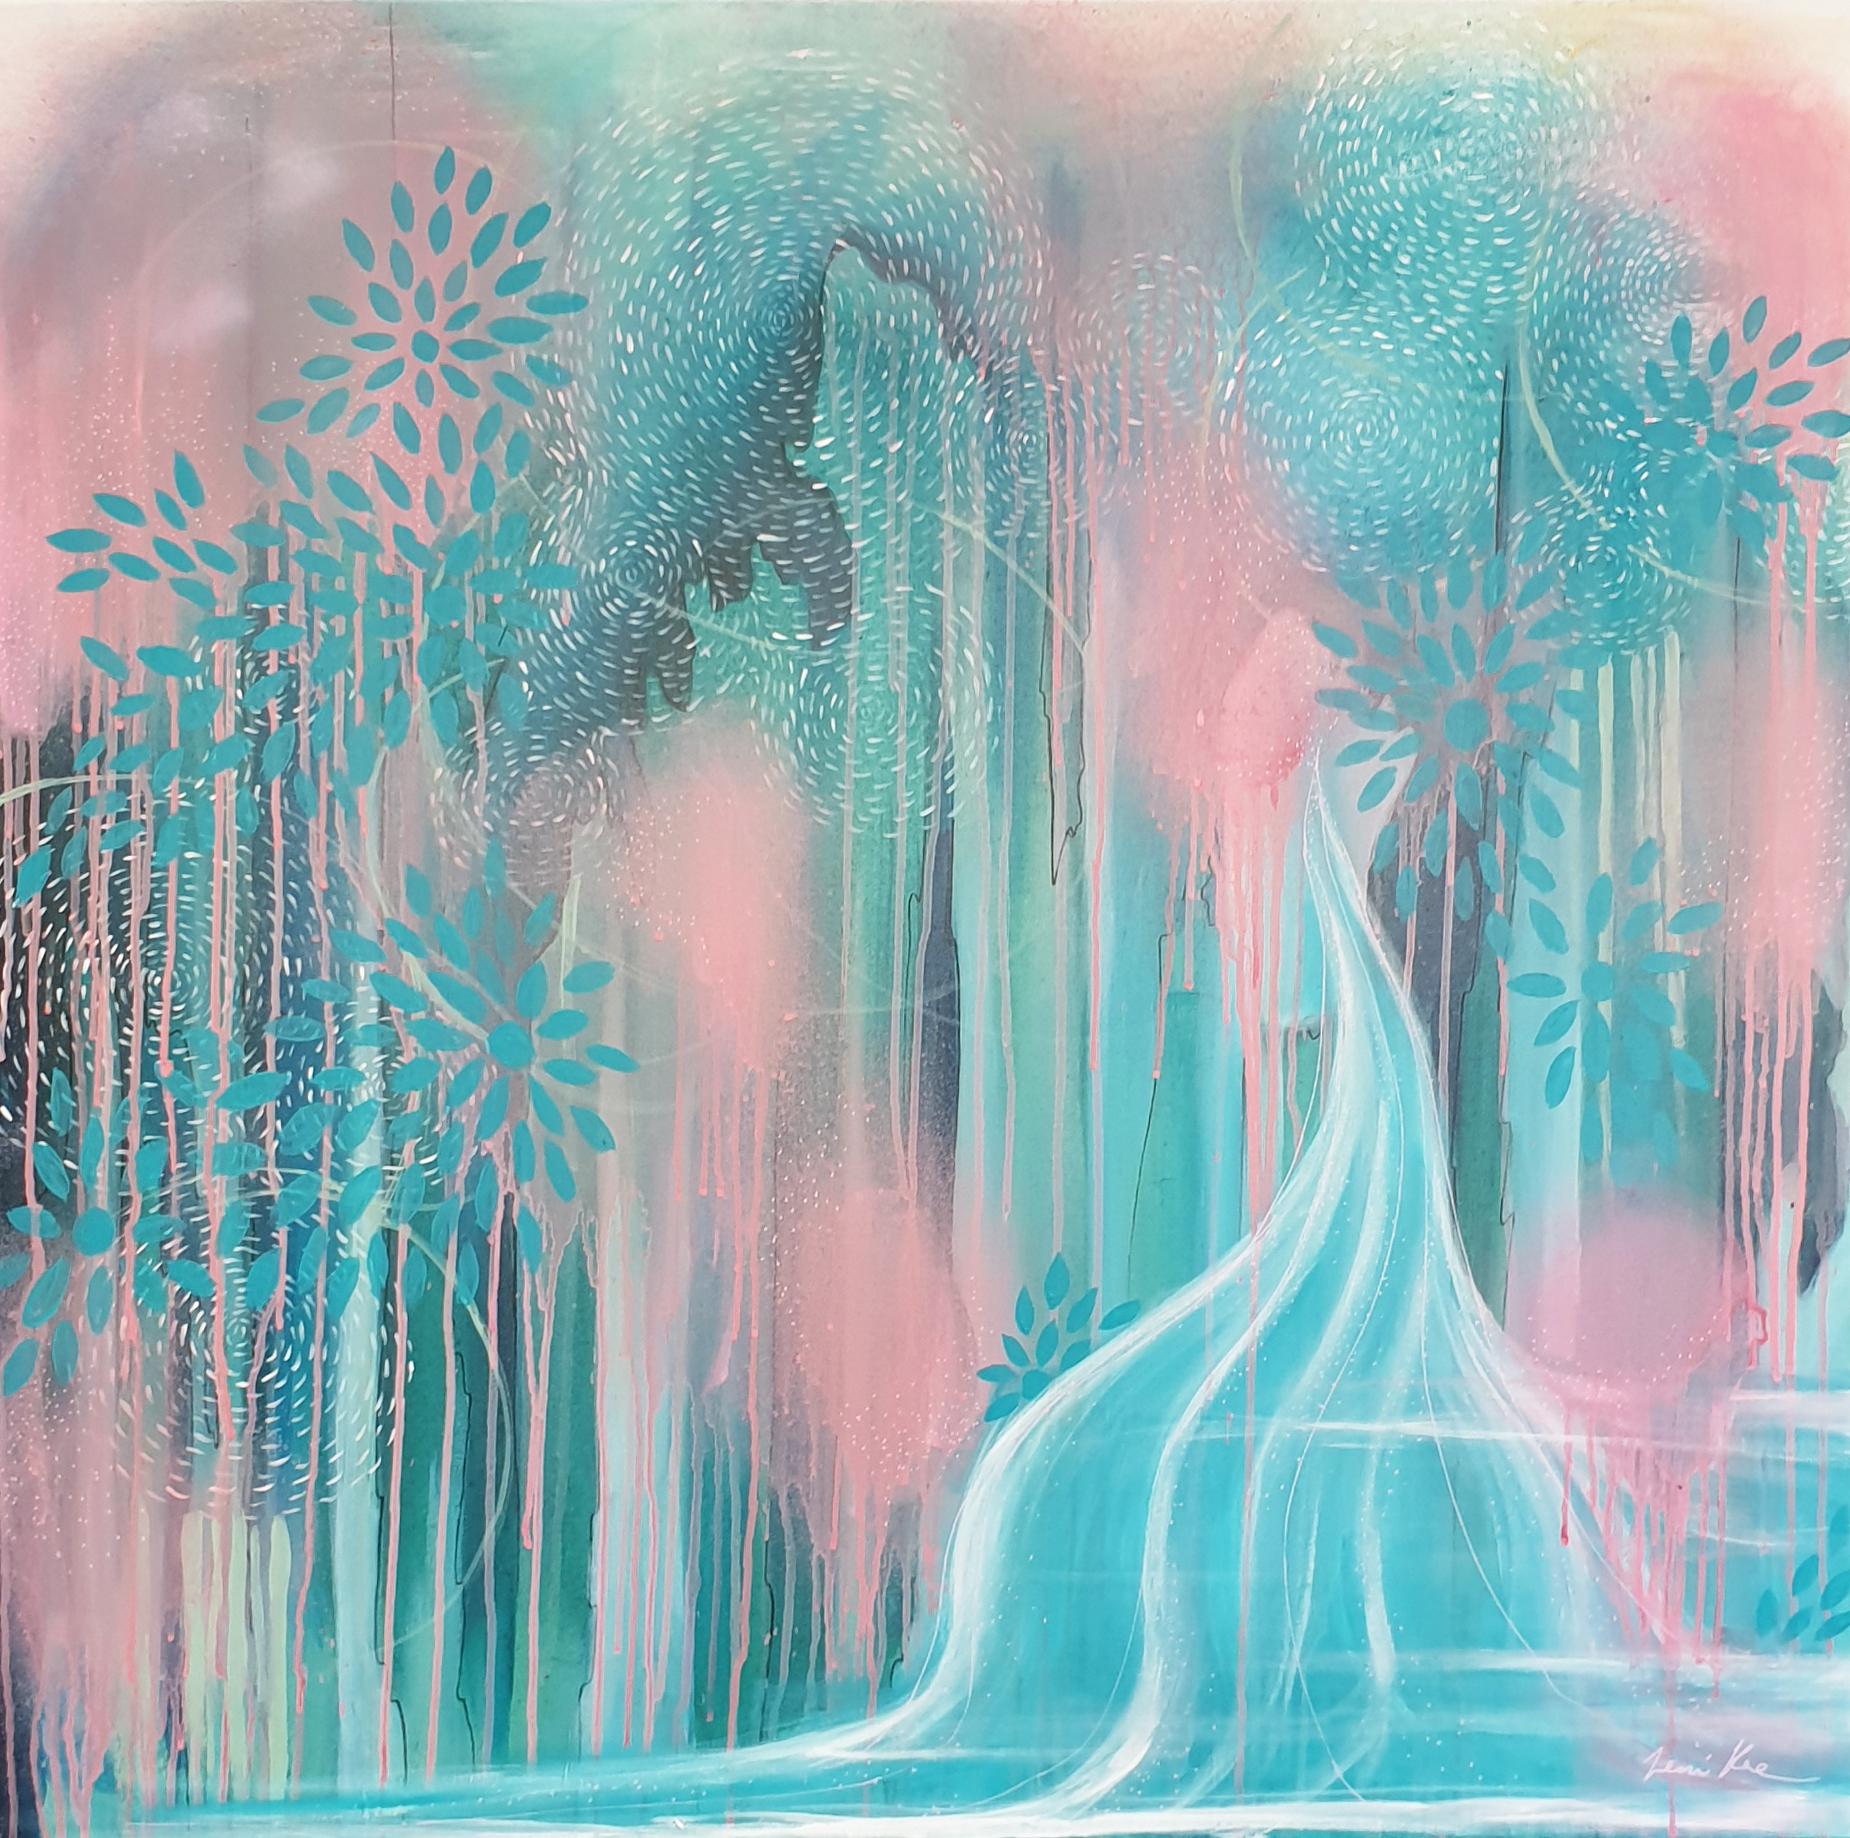 Leni Kae Icecream Sundae Waterfall Abstract Landscape Sale